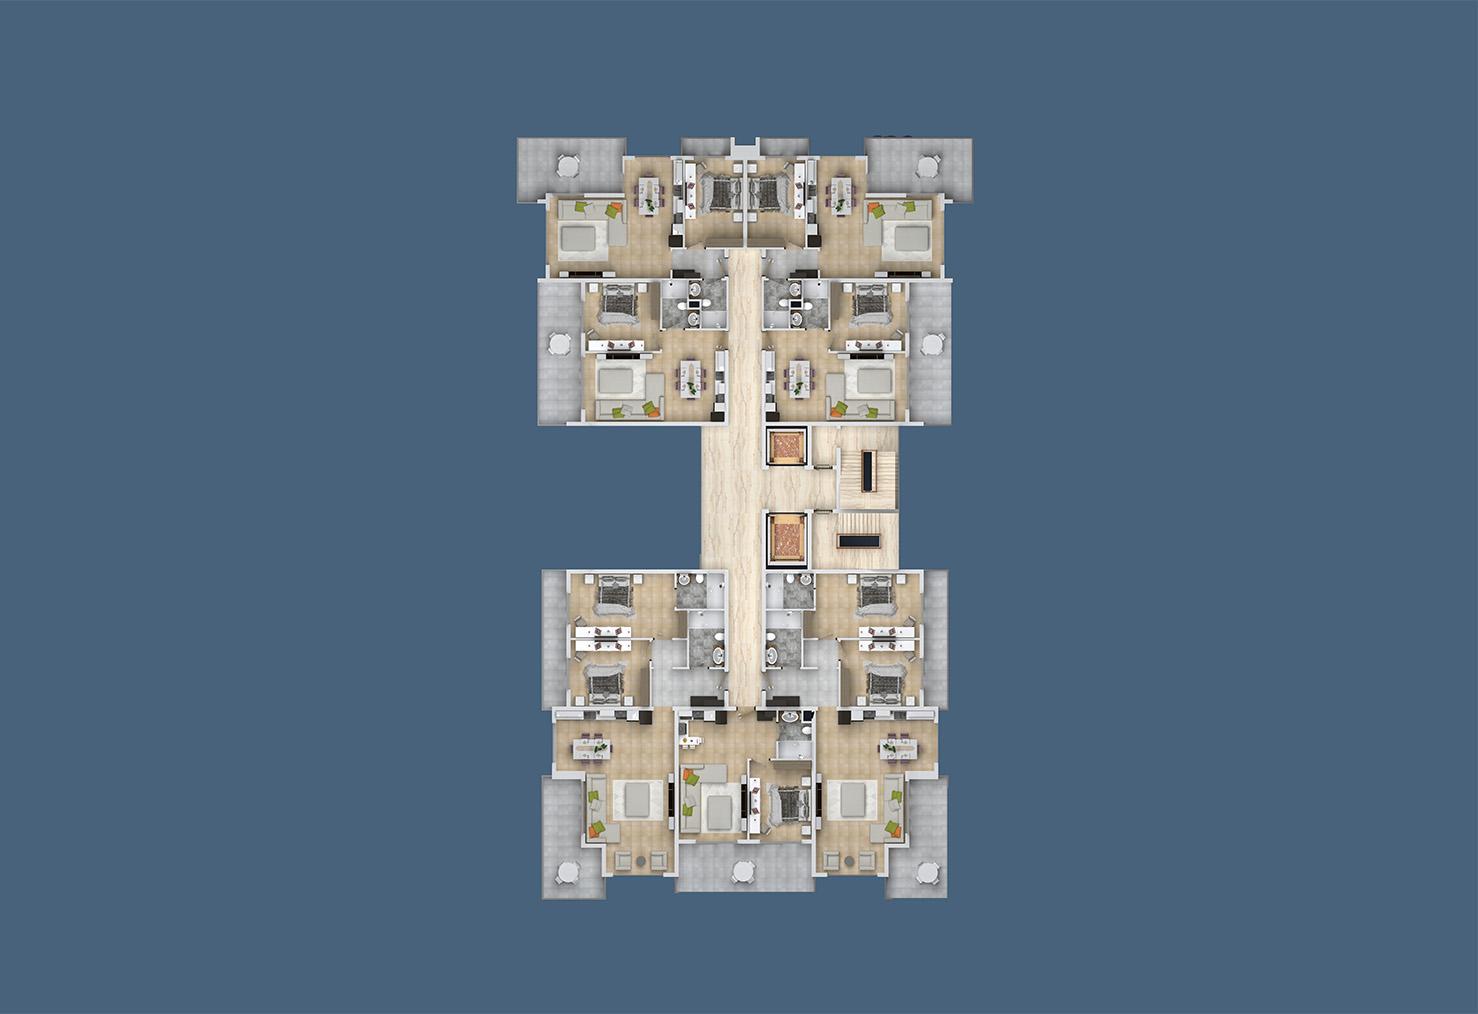 План расположения квартир 9 этаж A Yekta Kingdom Trade Center